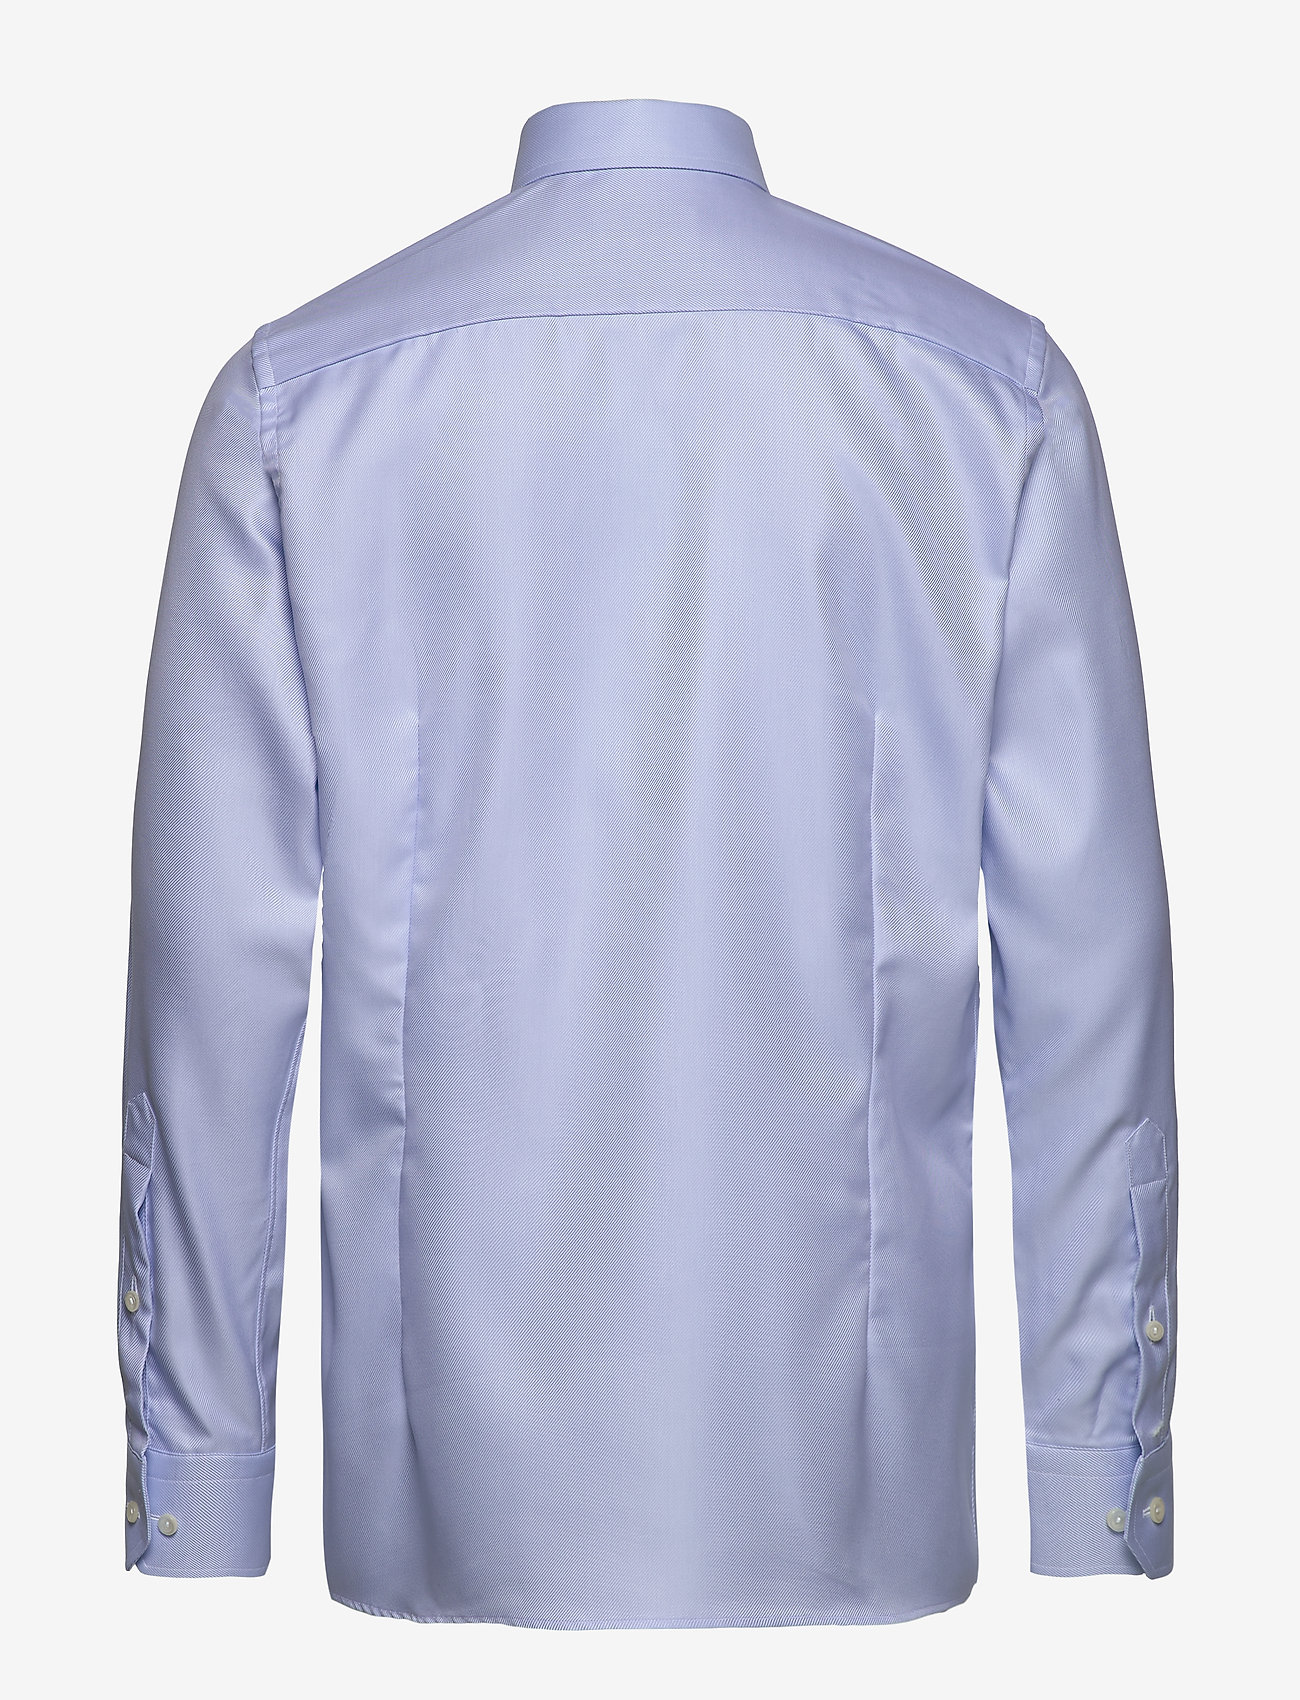 Eton - Harrogate-Collection-Contemporary fit - lina krekli - blue - 1